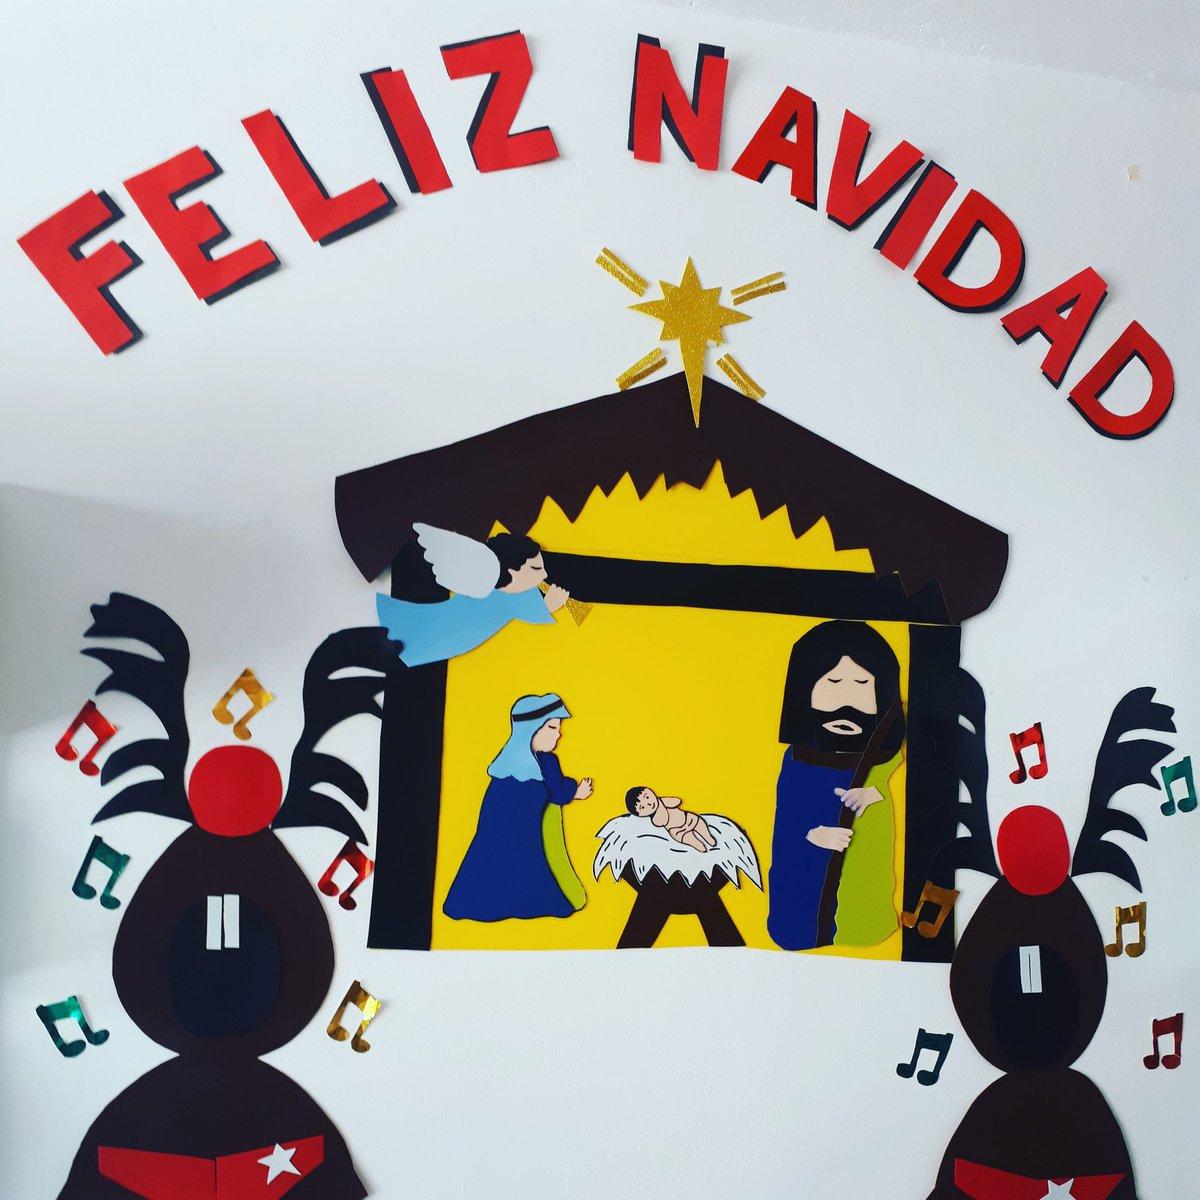 #xmas #christmas #temprano is soon this year in #ESPINAR #Cusco #PERU #peruvianculture #PeruTheRichestCountry #TRAVELPERU #travel #Peru #vamosperu #arribaperu #visitperu #trescañones…  http://Espinarperu.com   @Havenlust @clairesturz @XmasFilmQuotes @xmas_reacts